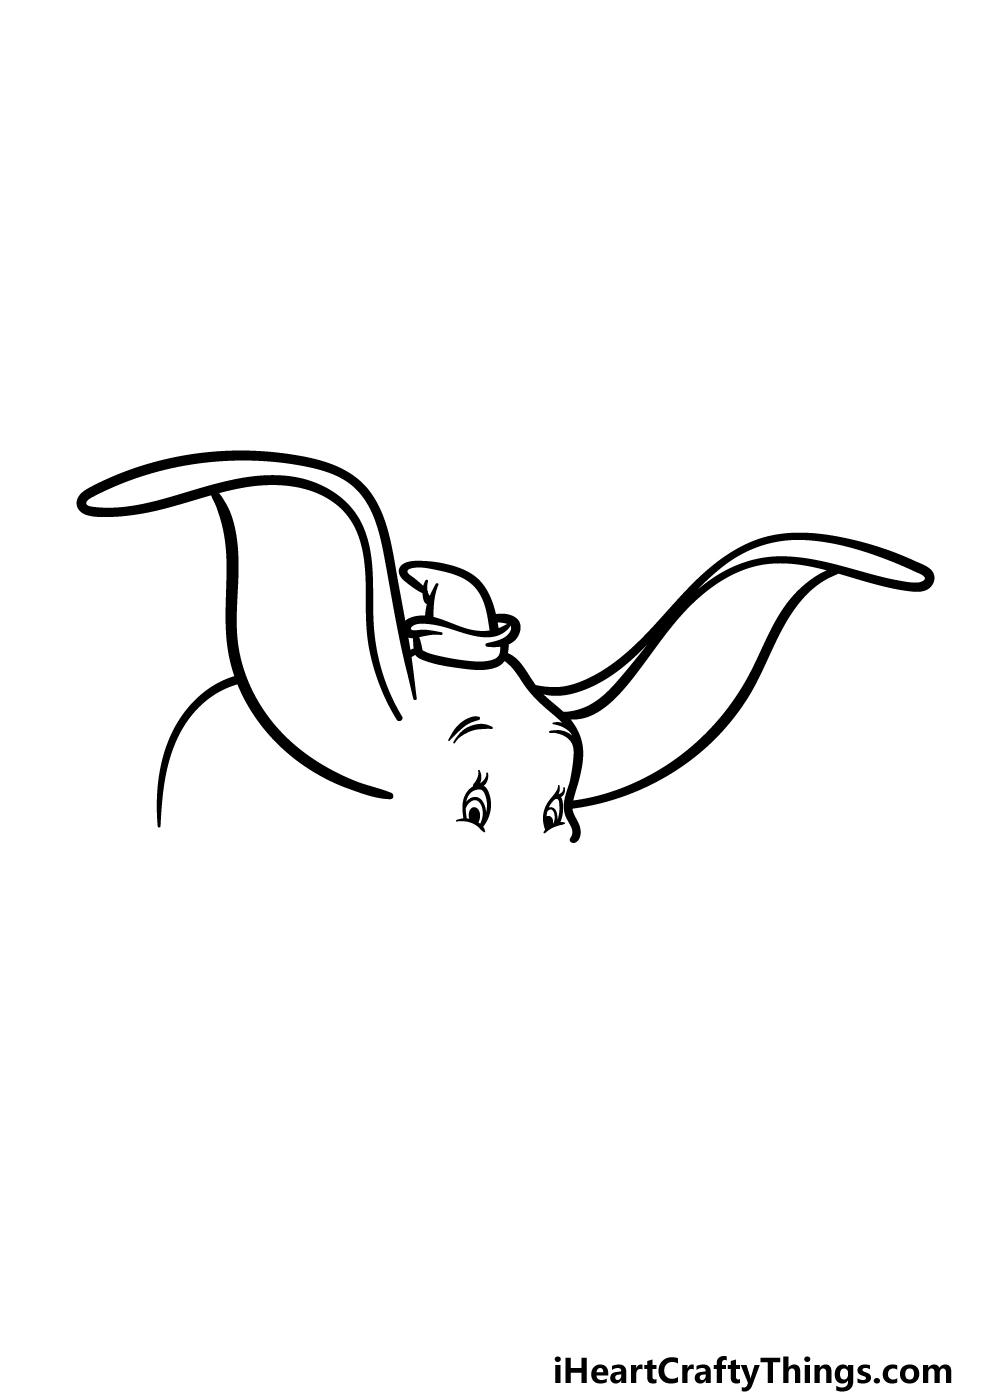 drawing Dumbo step 2